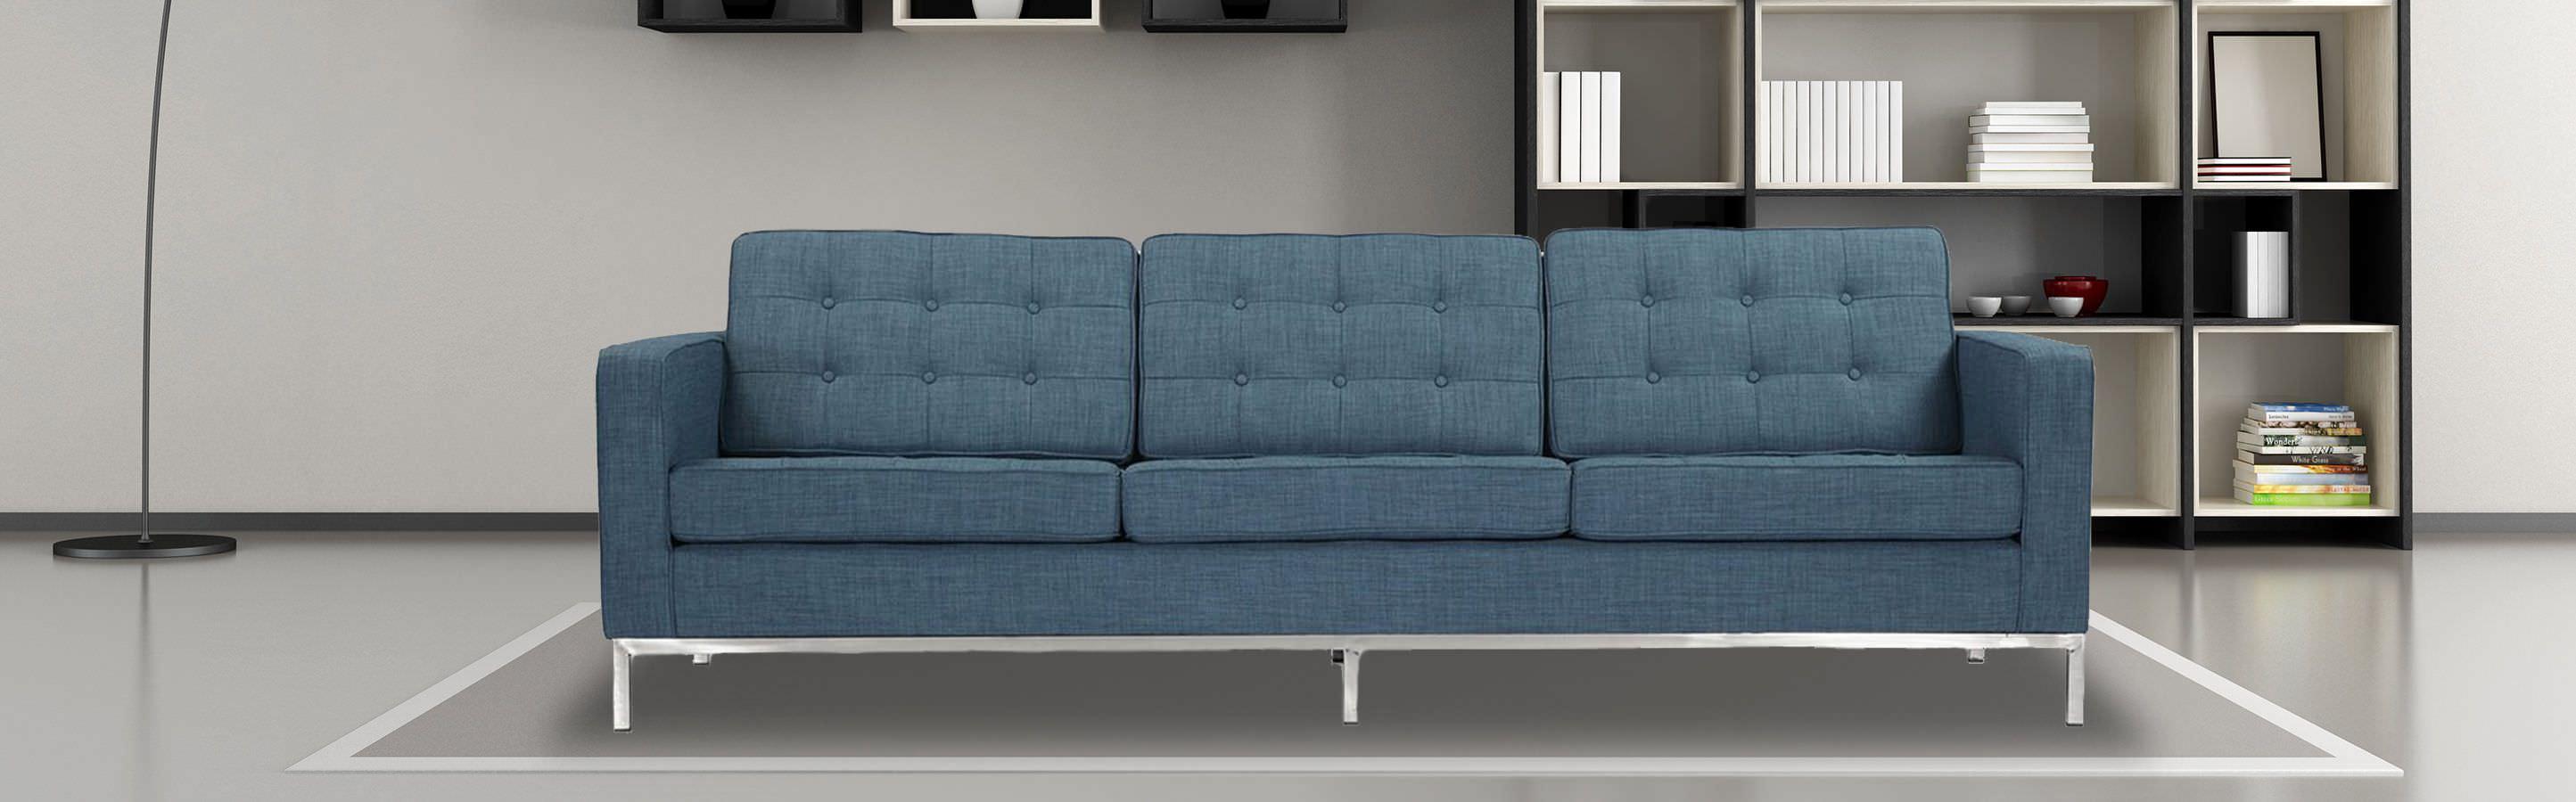 Florence Mid Century Modern Sofa